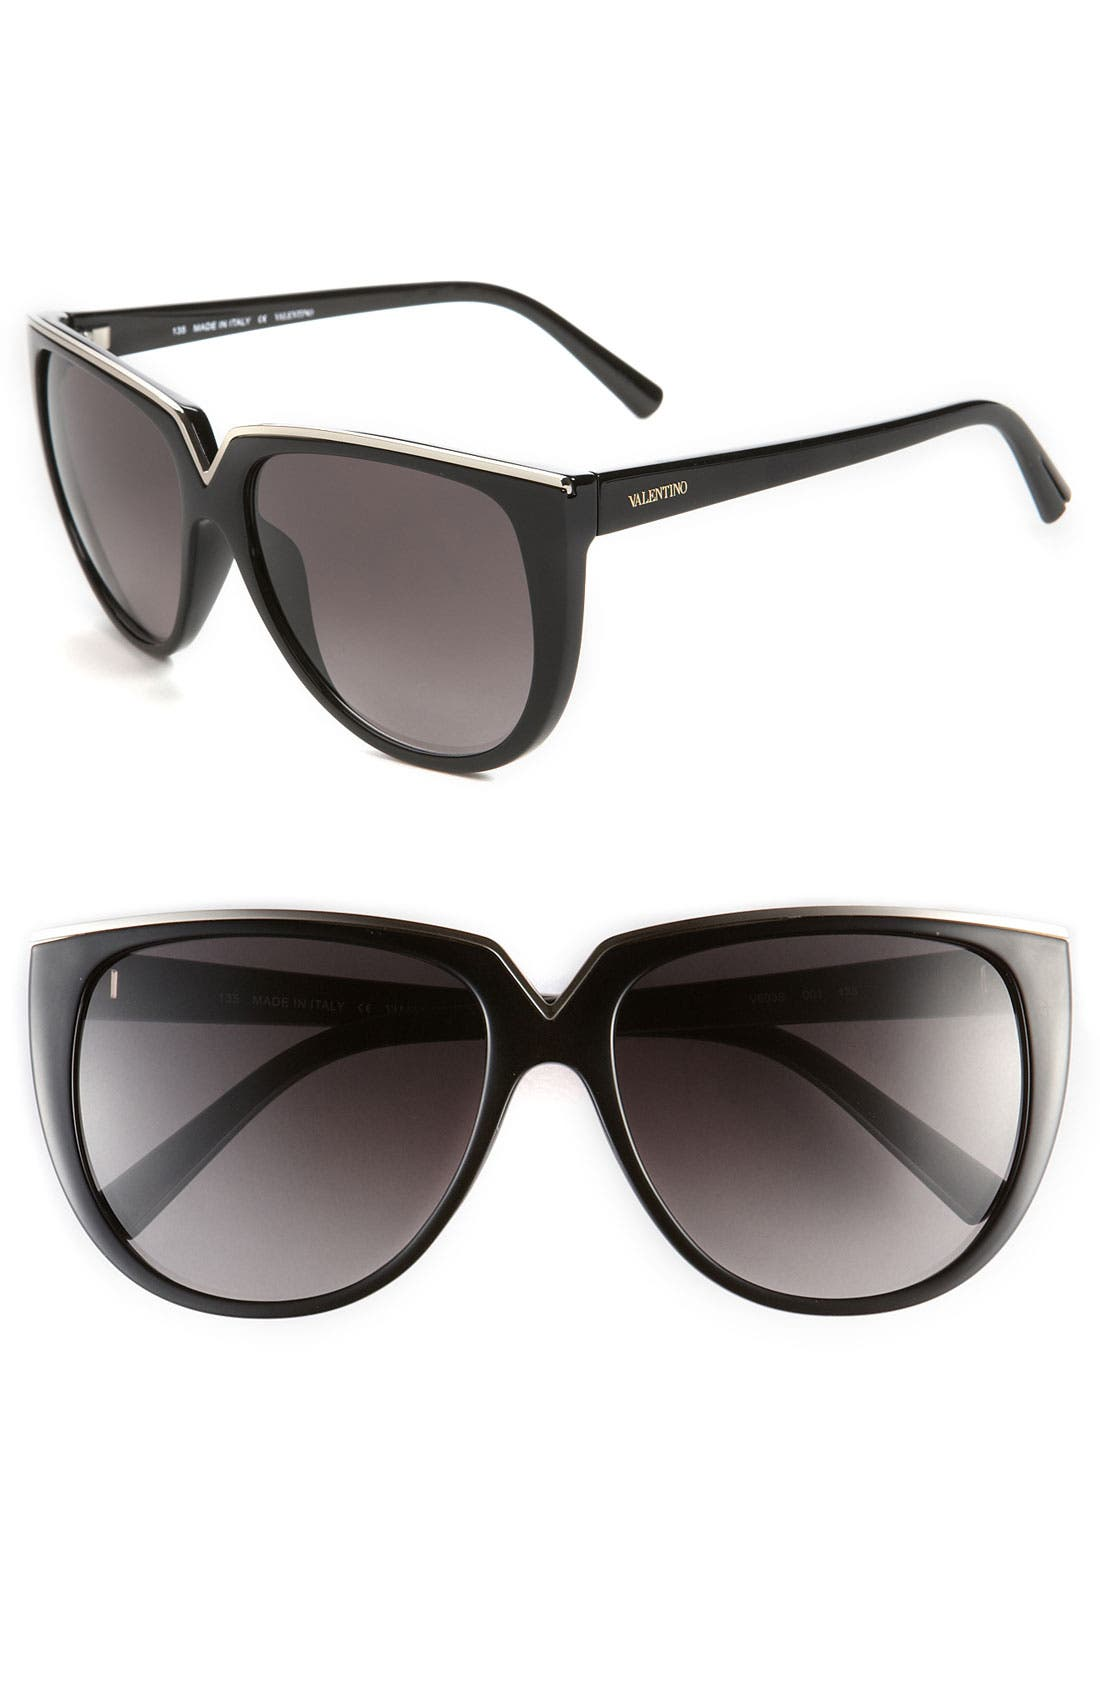 Alternate Image 1 Selected - Valentino 57mm Retro Sunglasses